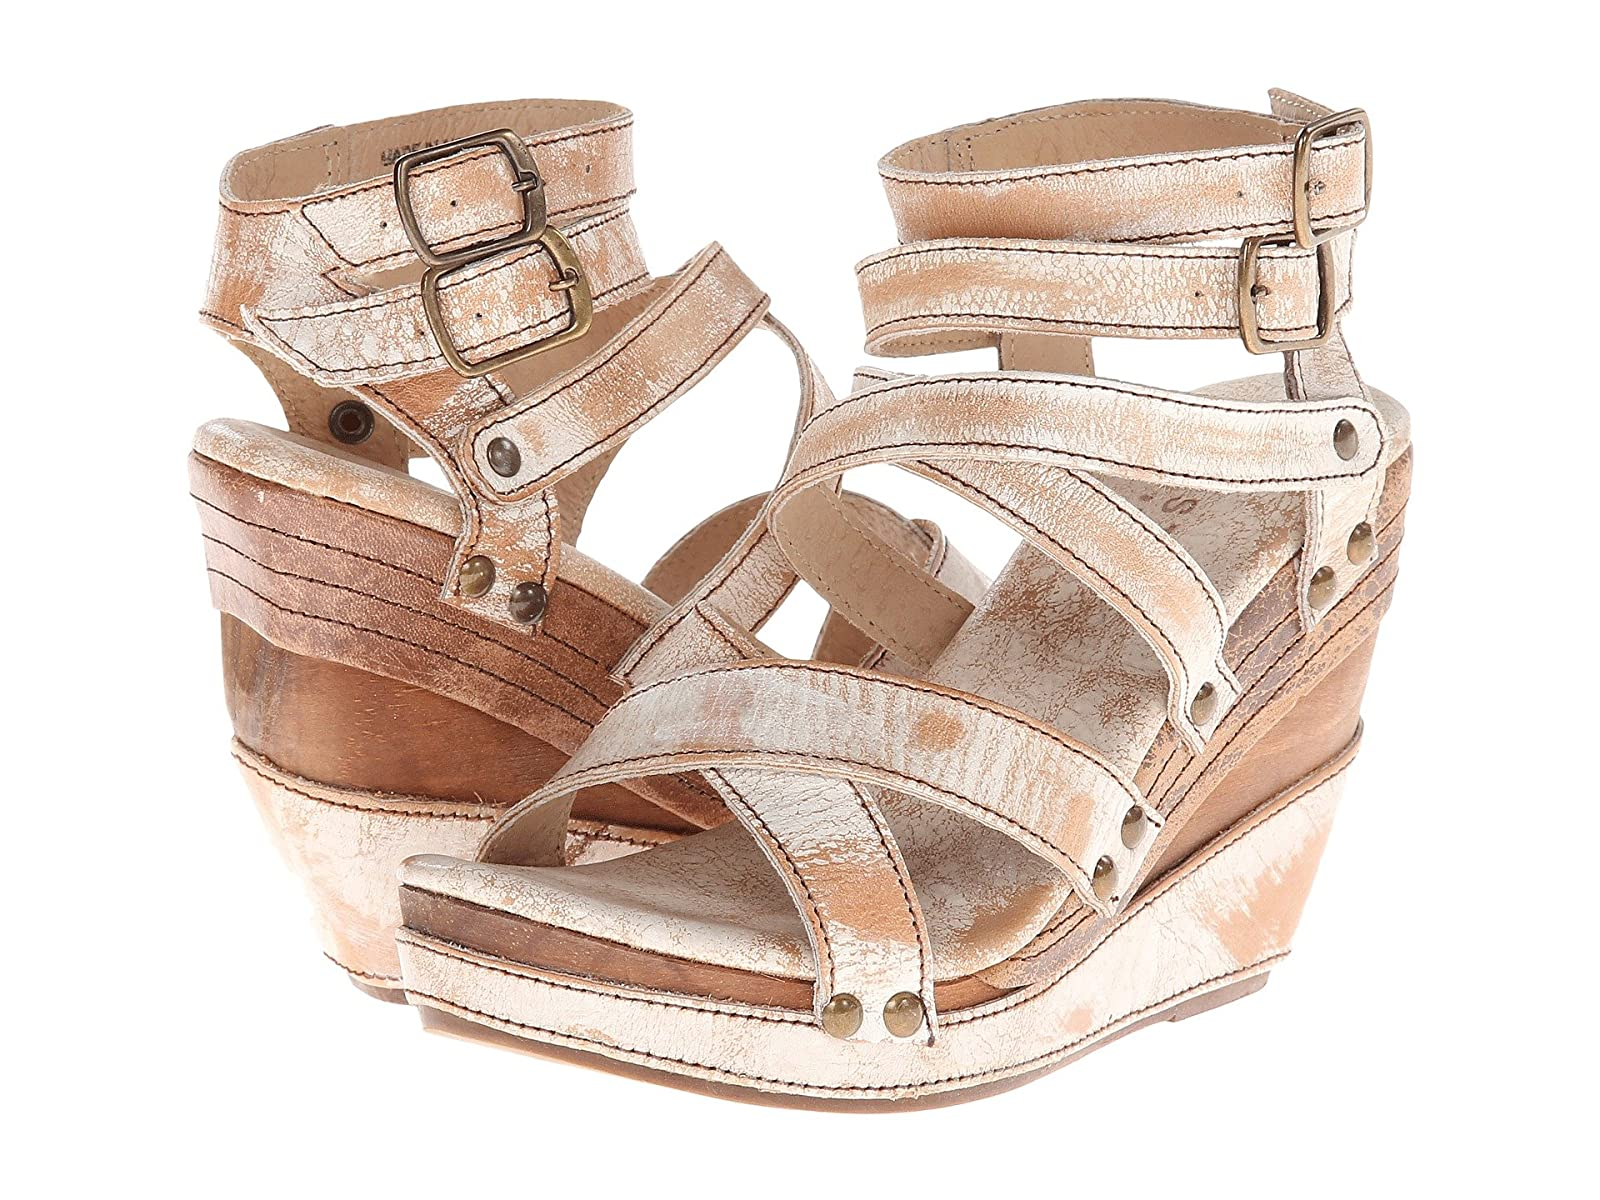 Bed Stu JulianaCheap and distinctive eye-catching shoes